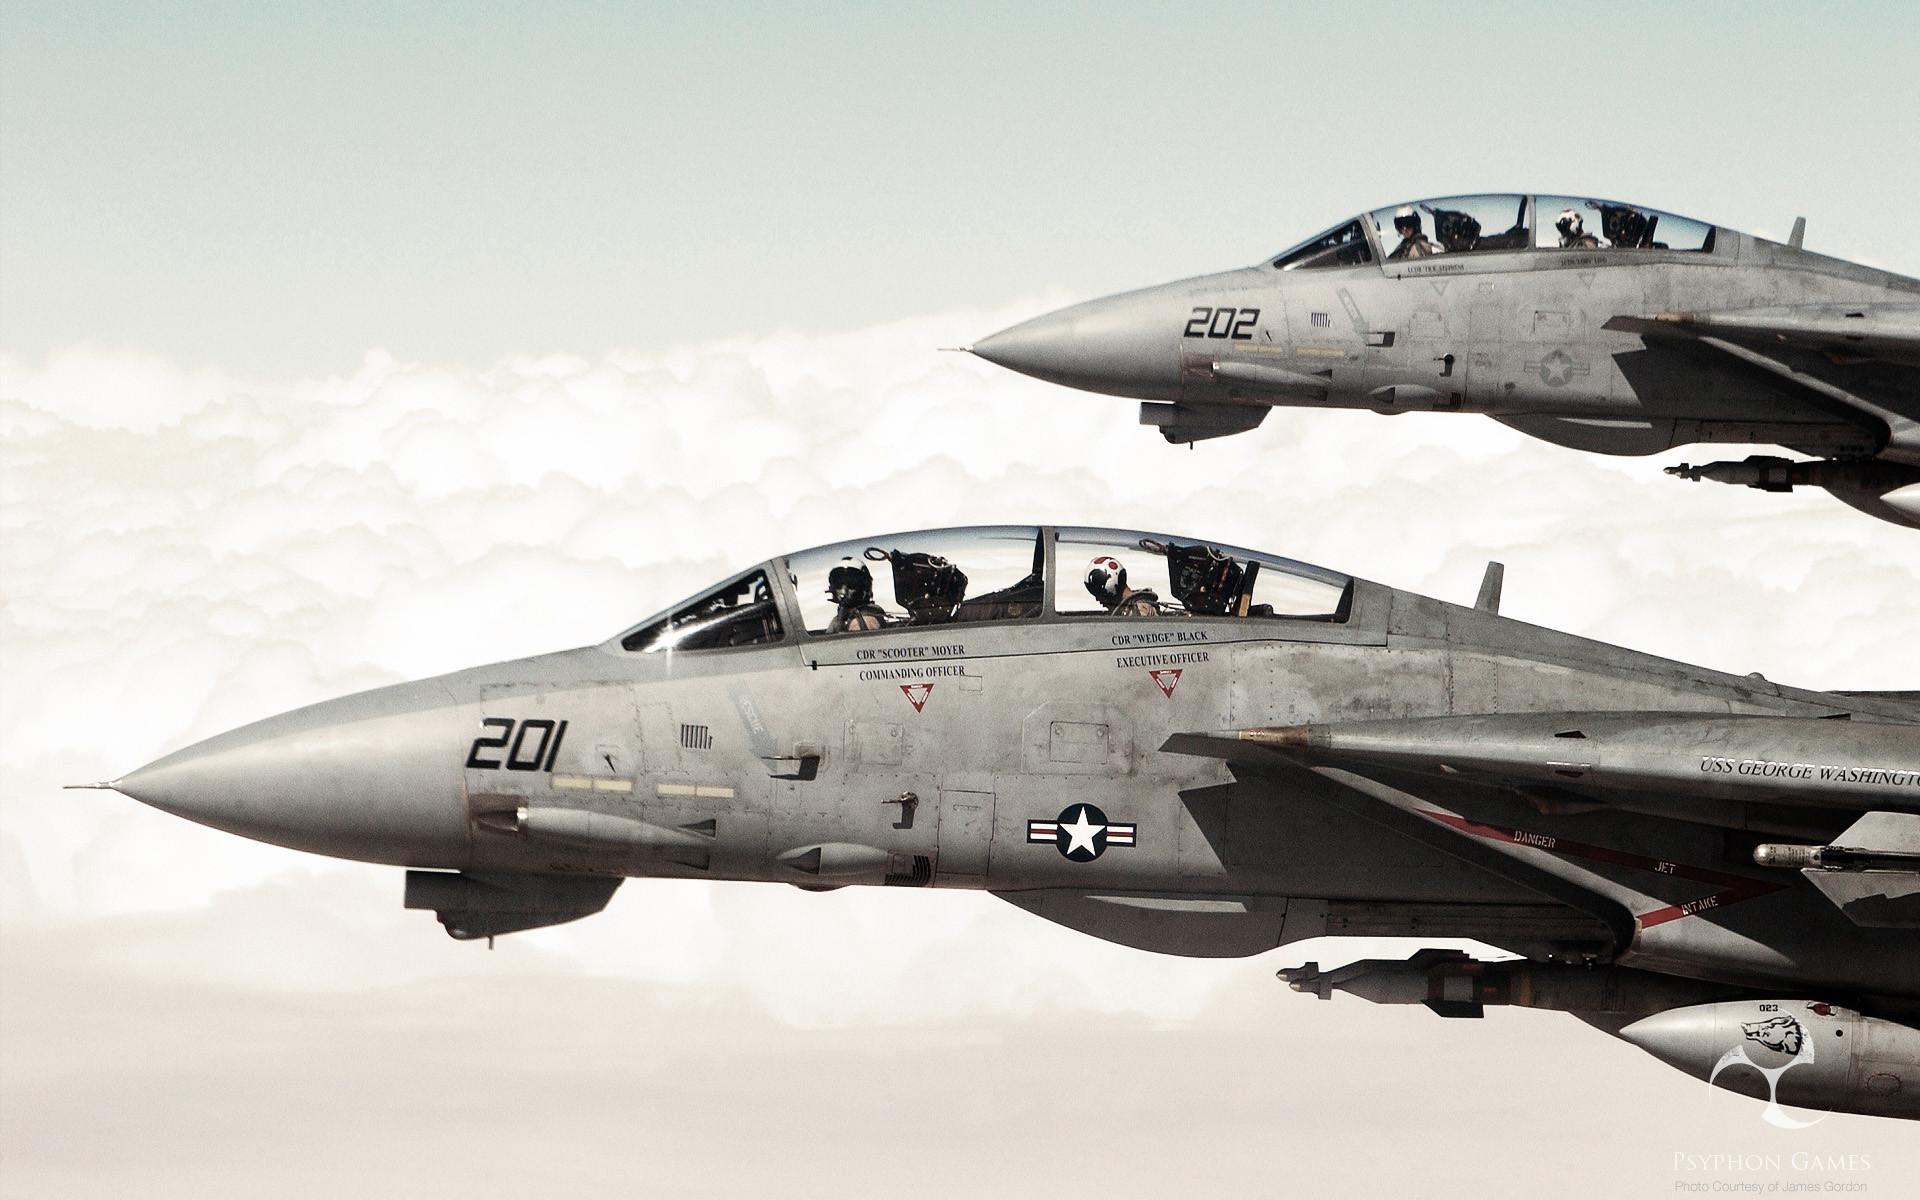 Grumman F-14 Tomcat new wallpapers